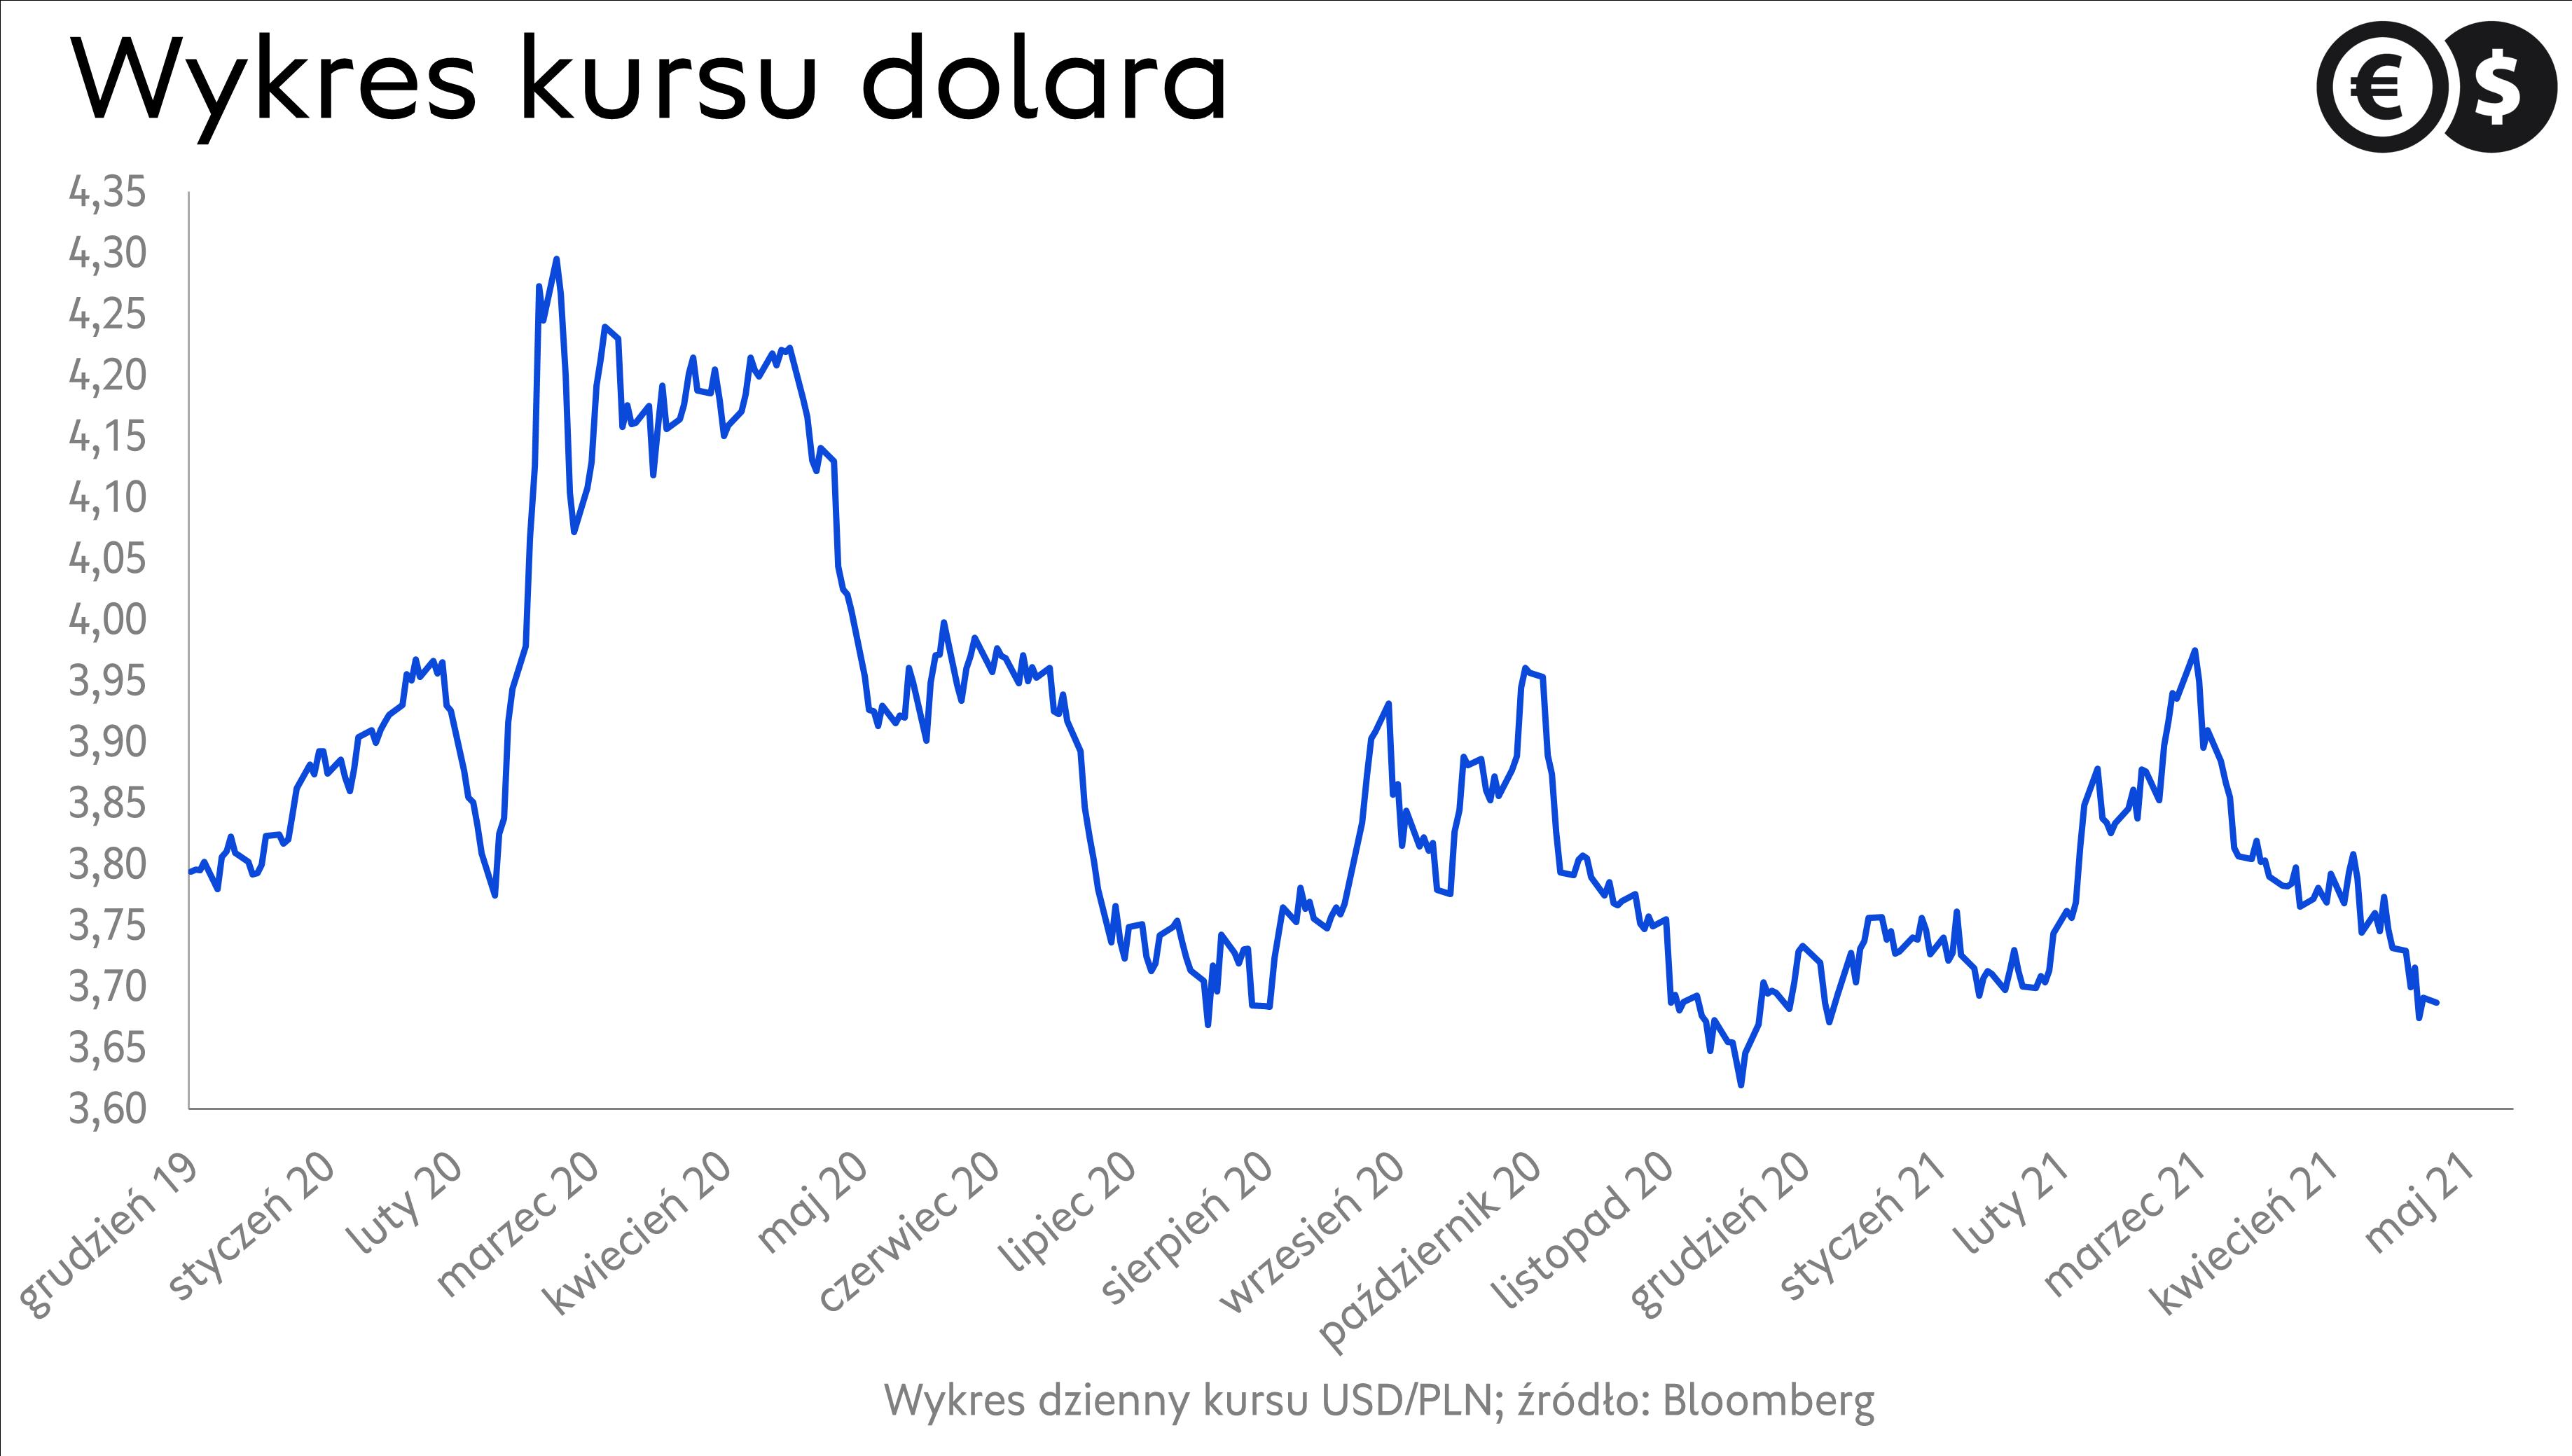 Kurs dolara, wykres USD/PLN; źródło: Bloomberg